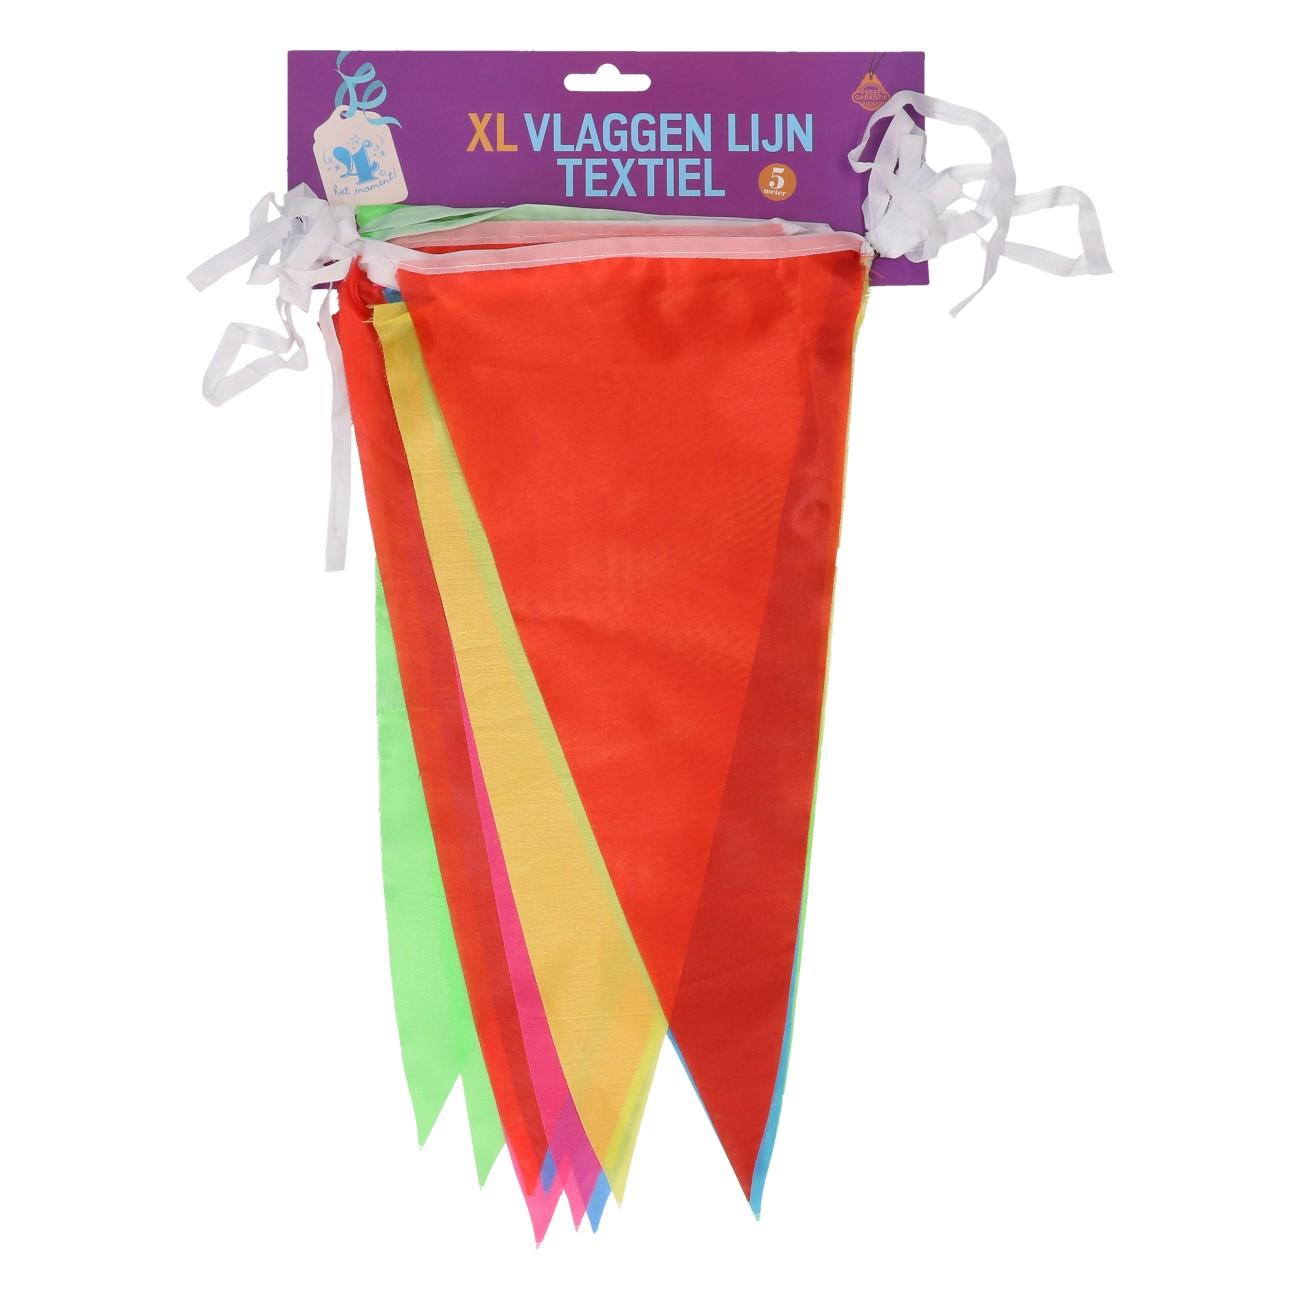 Vlaggen lijn textiel XL